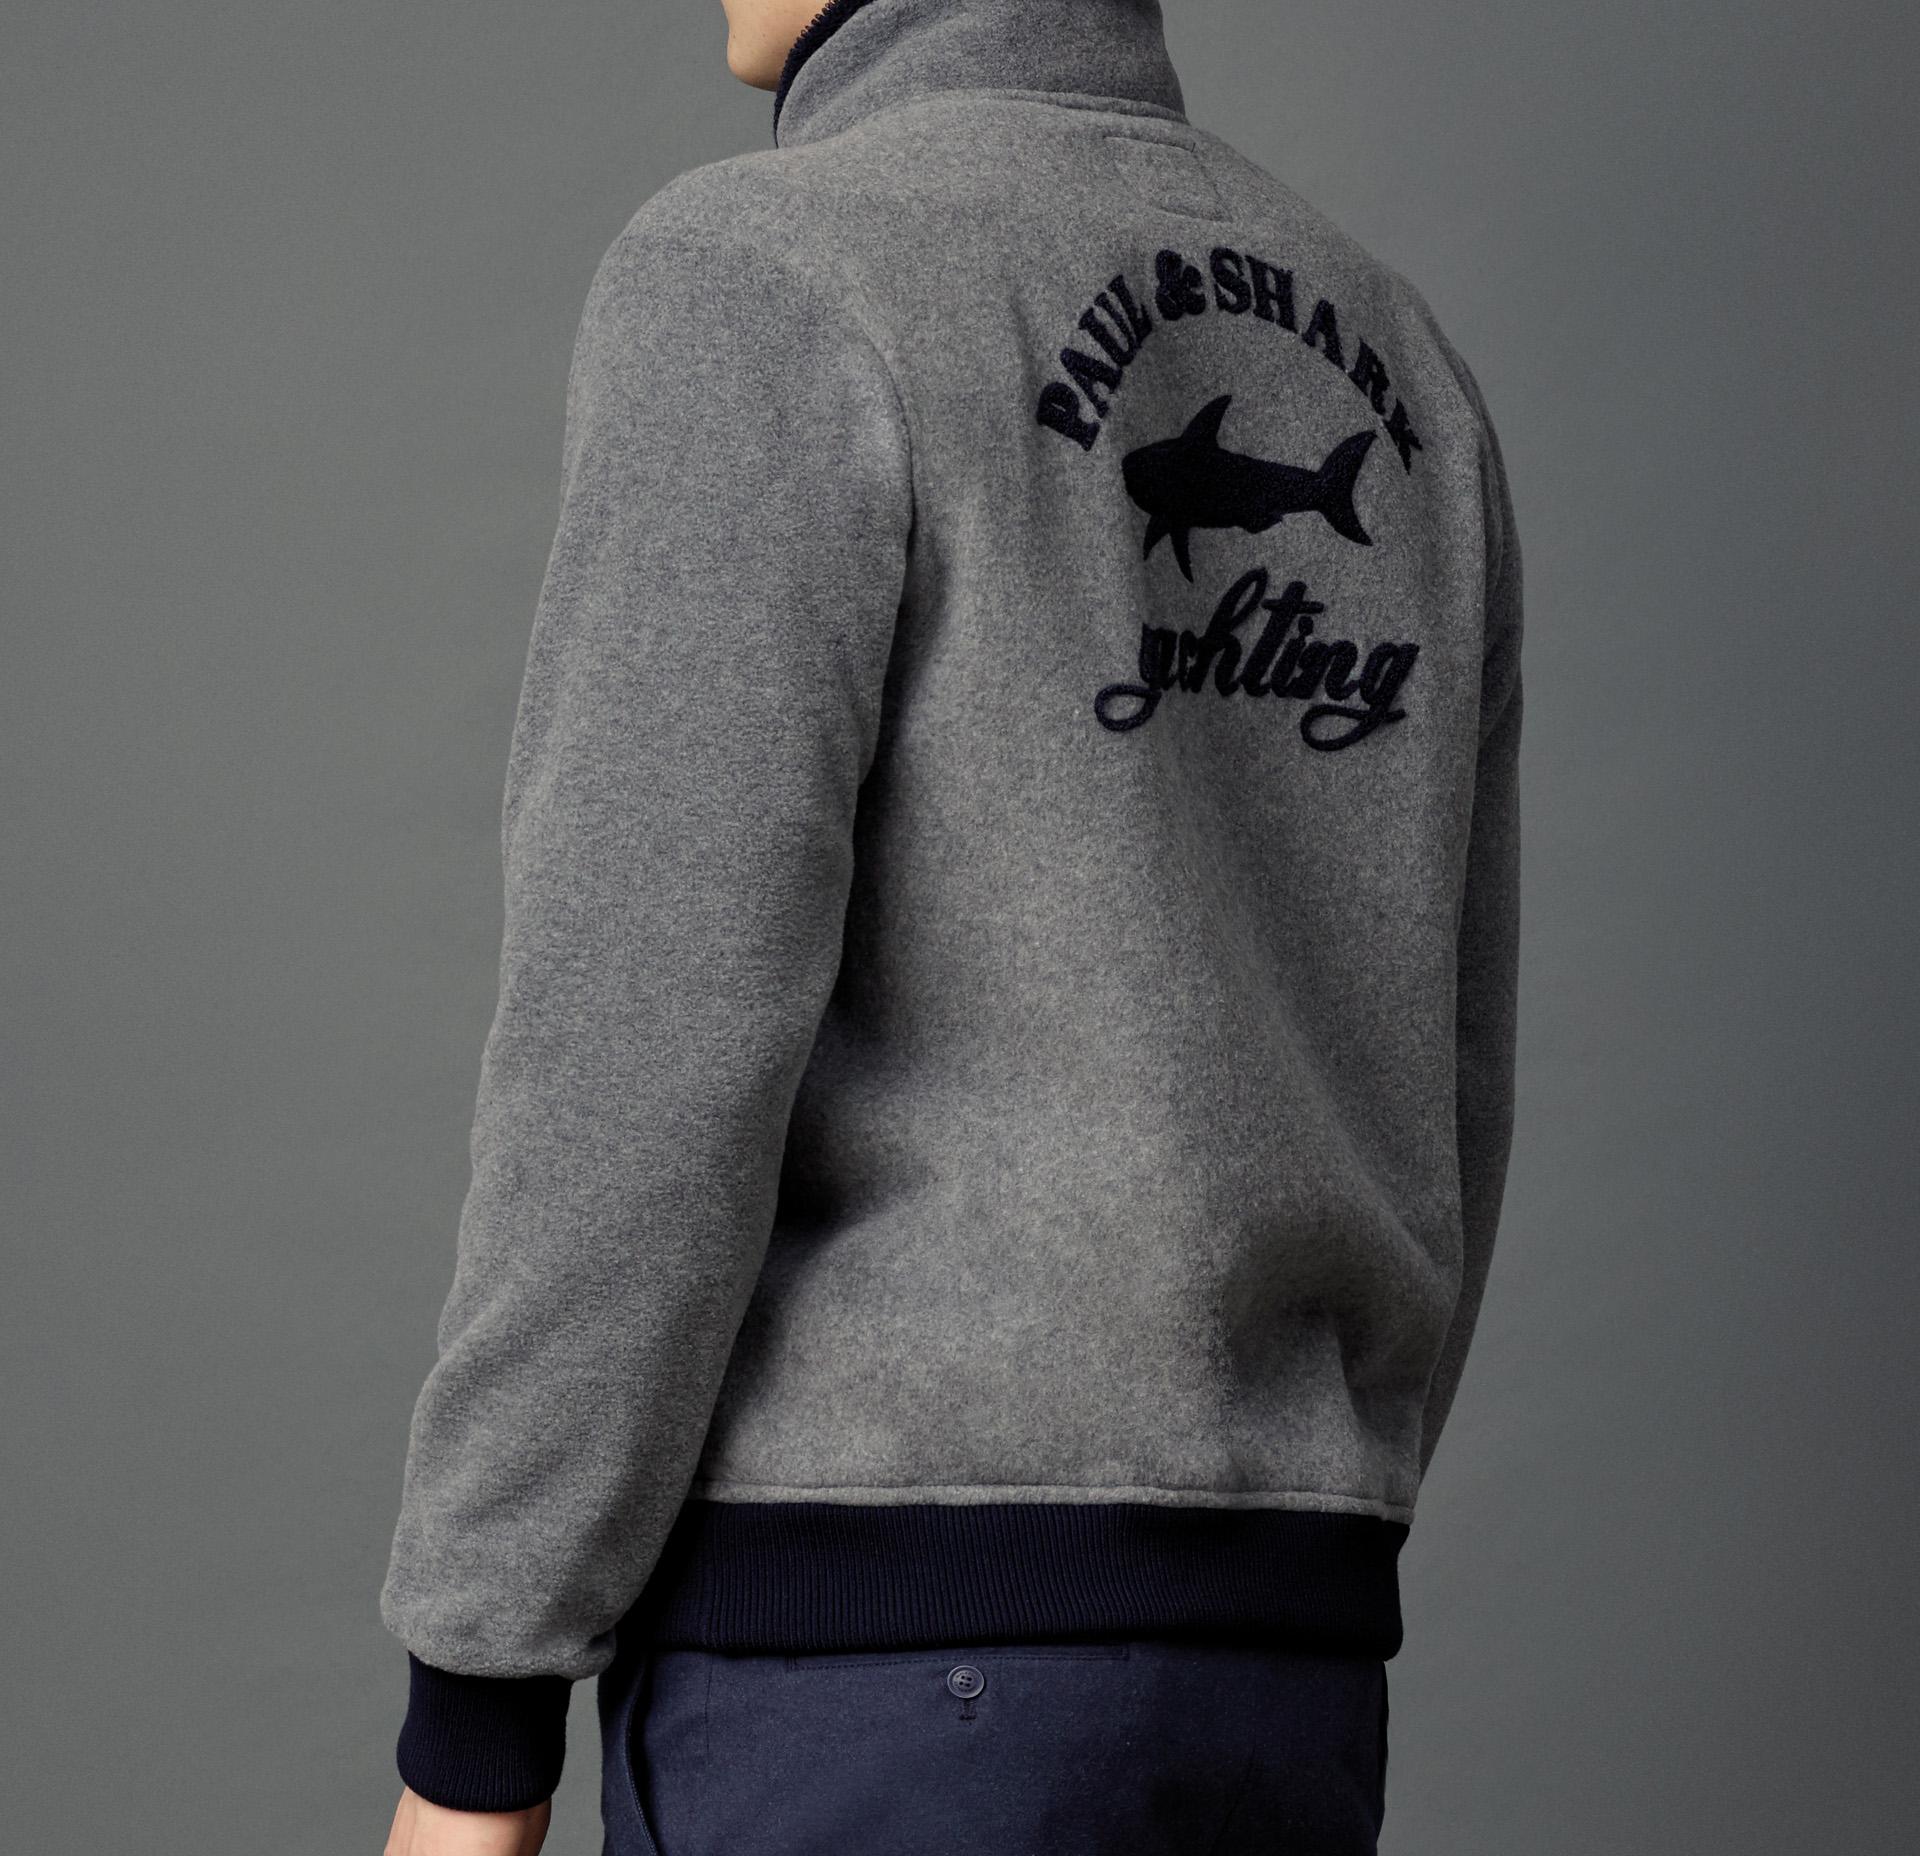 Paul & shark jacket